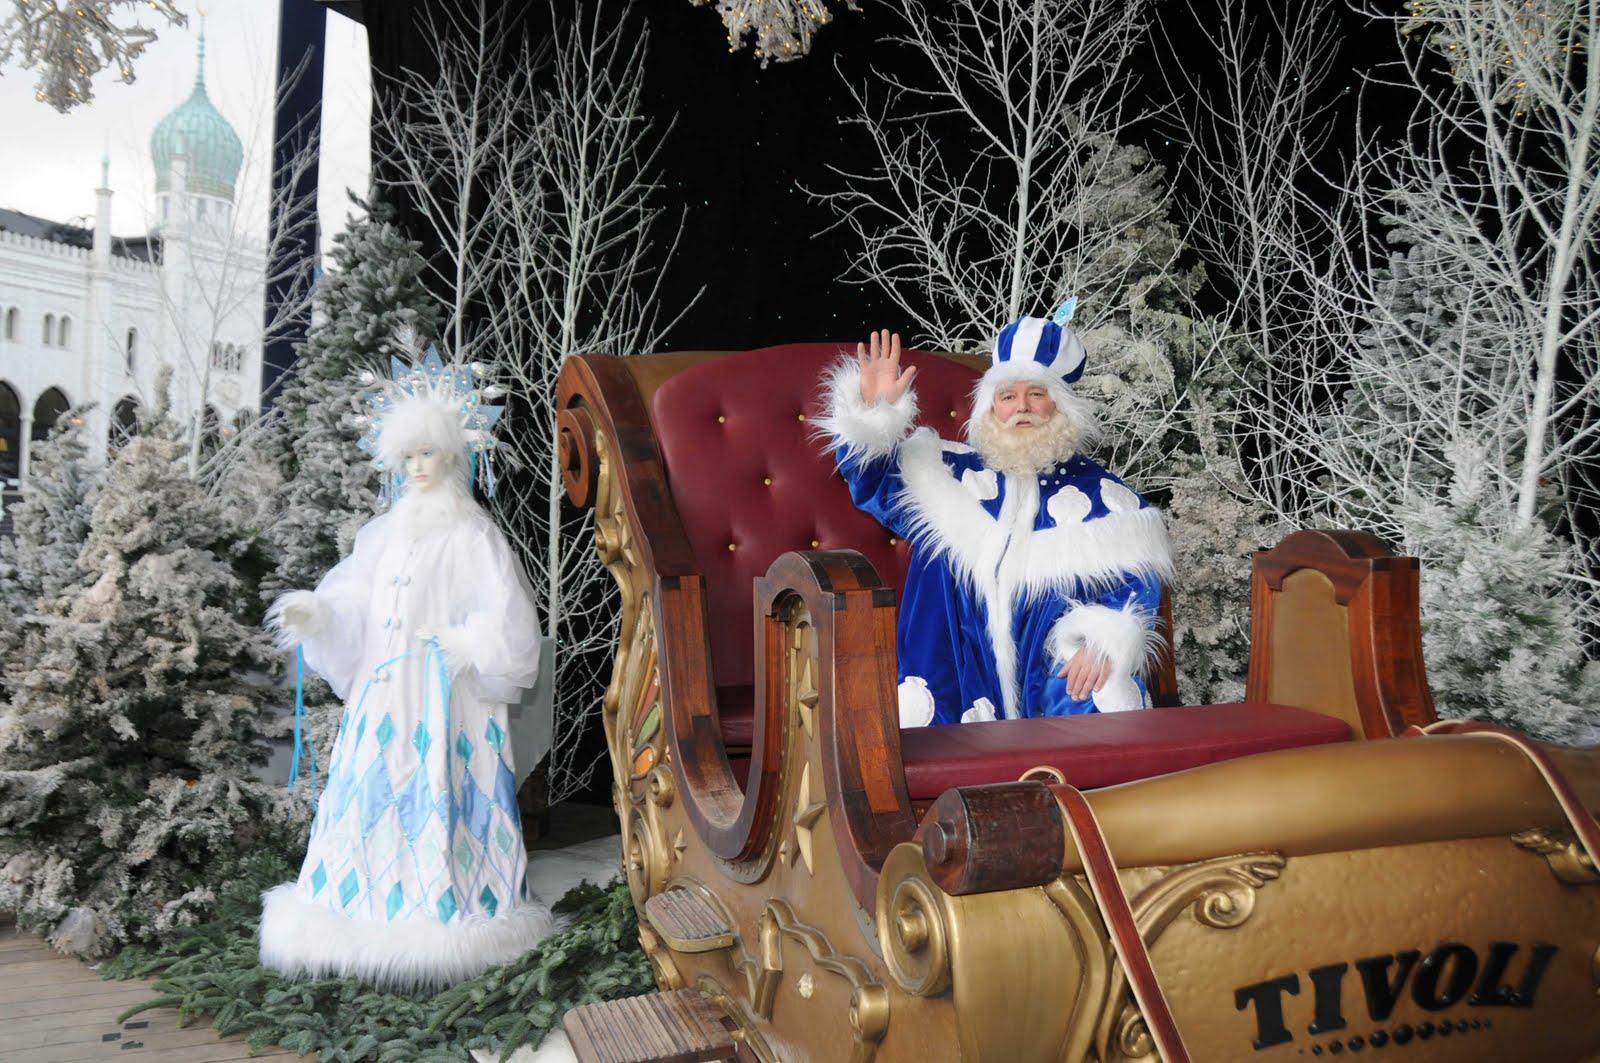 juleudsmykning i tivoli